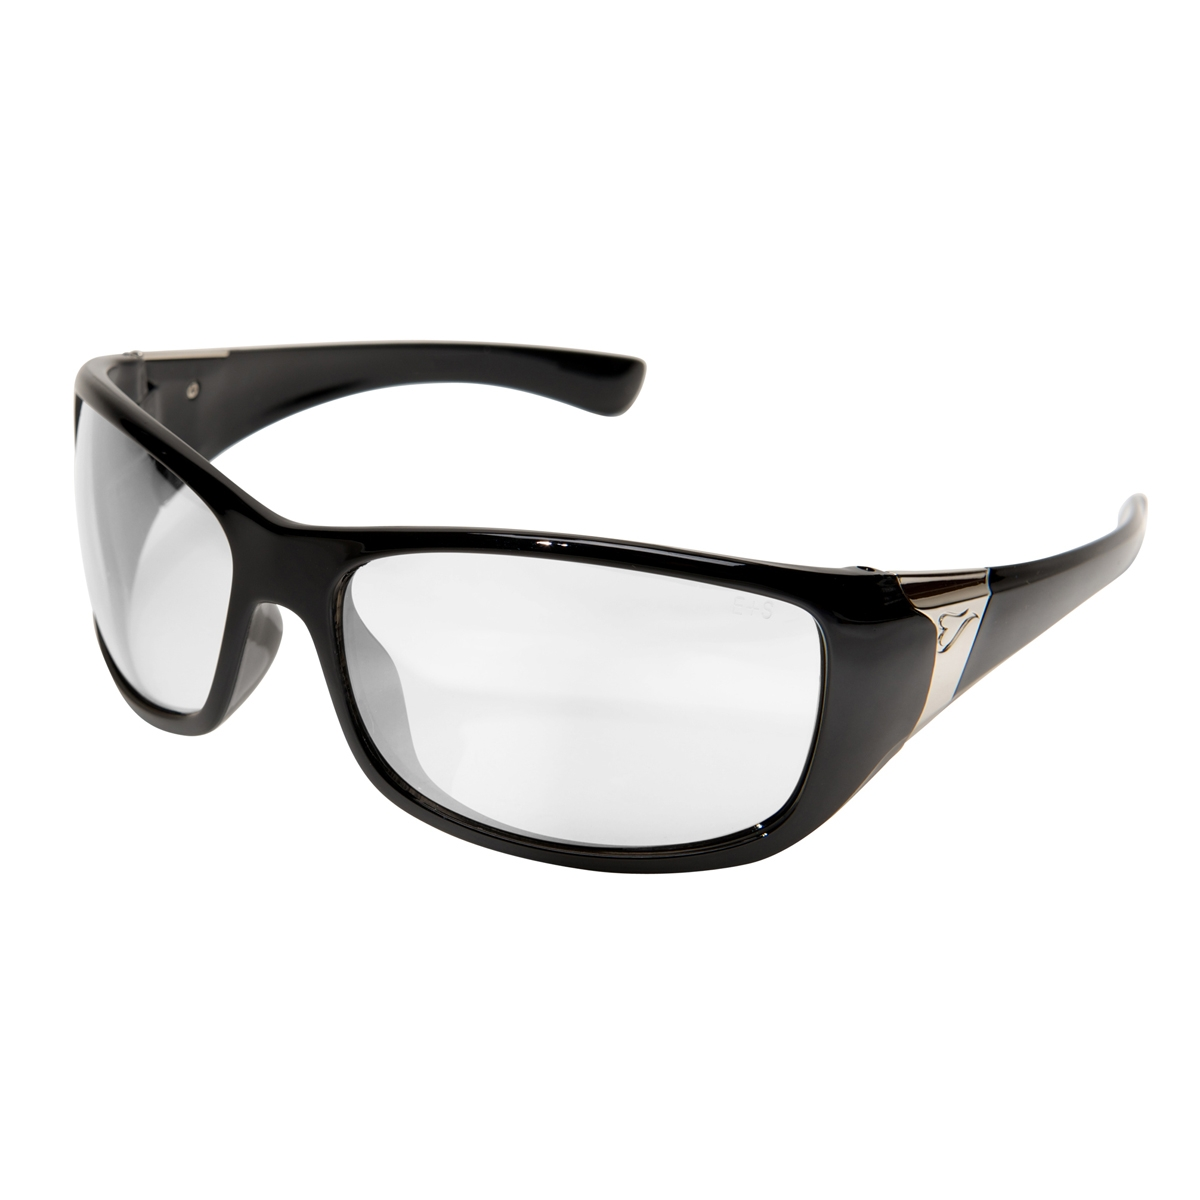 Ladies Black Frame Glasses : Edge YC111 Civetta Ladies Safety Glasses - Black Frame ...